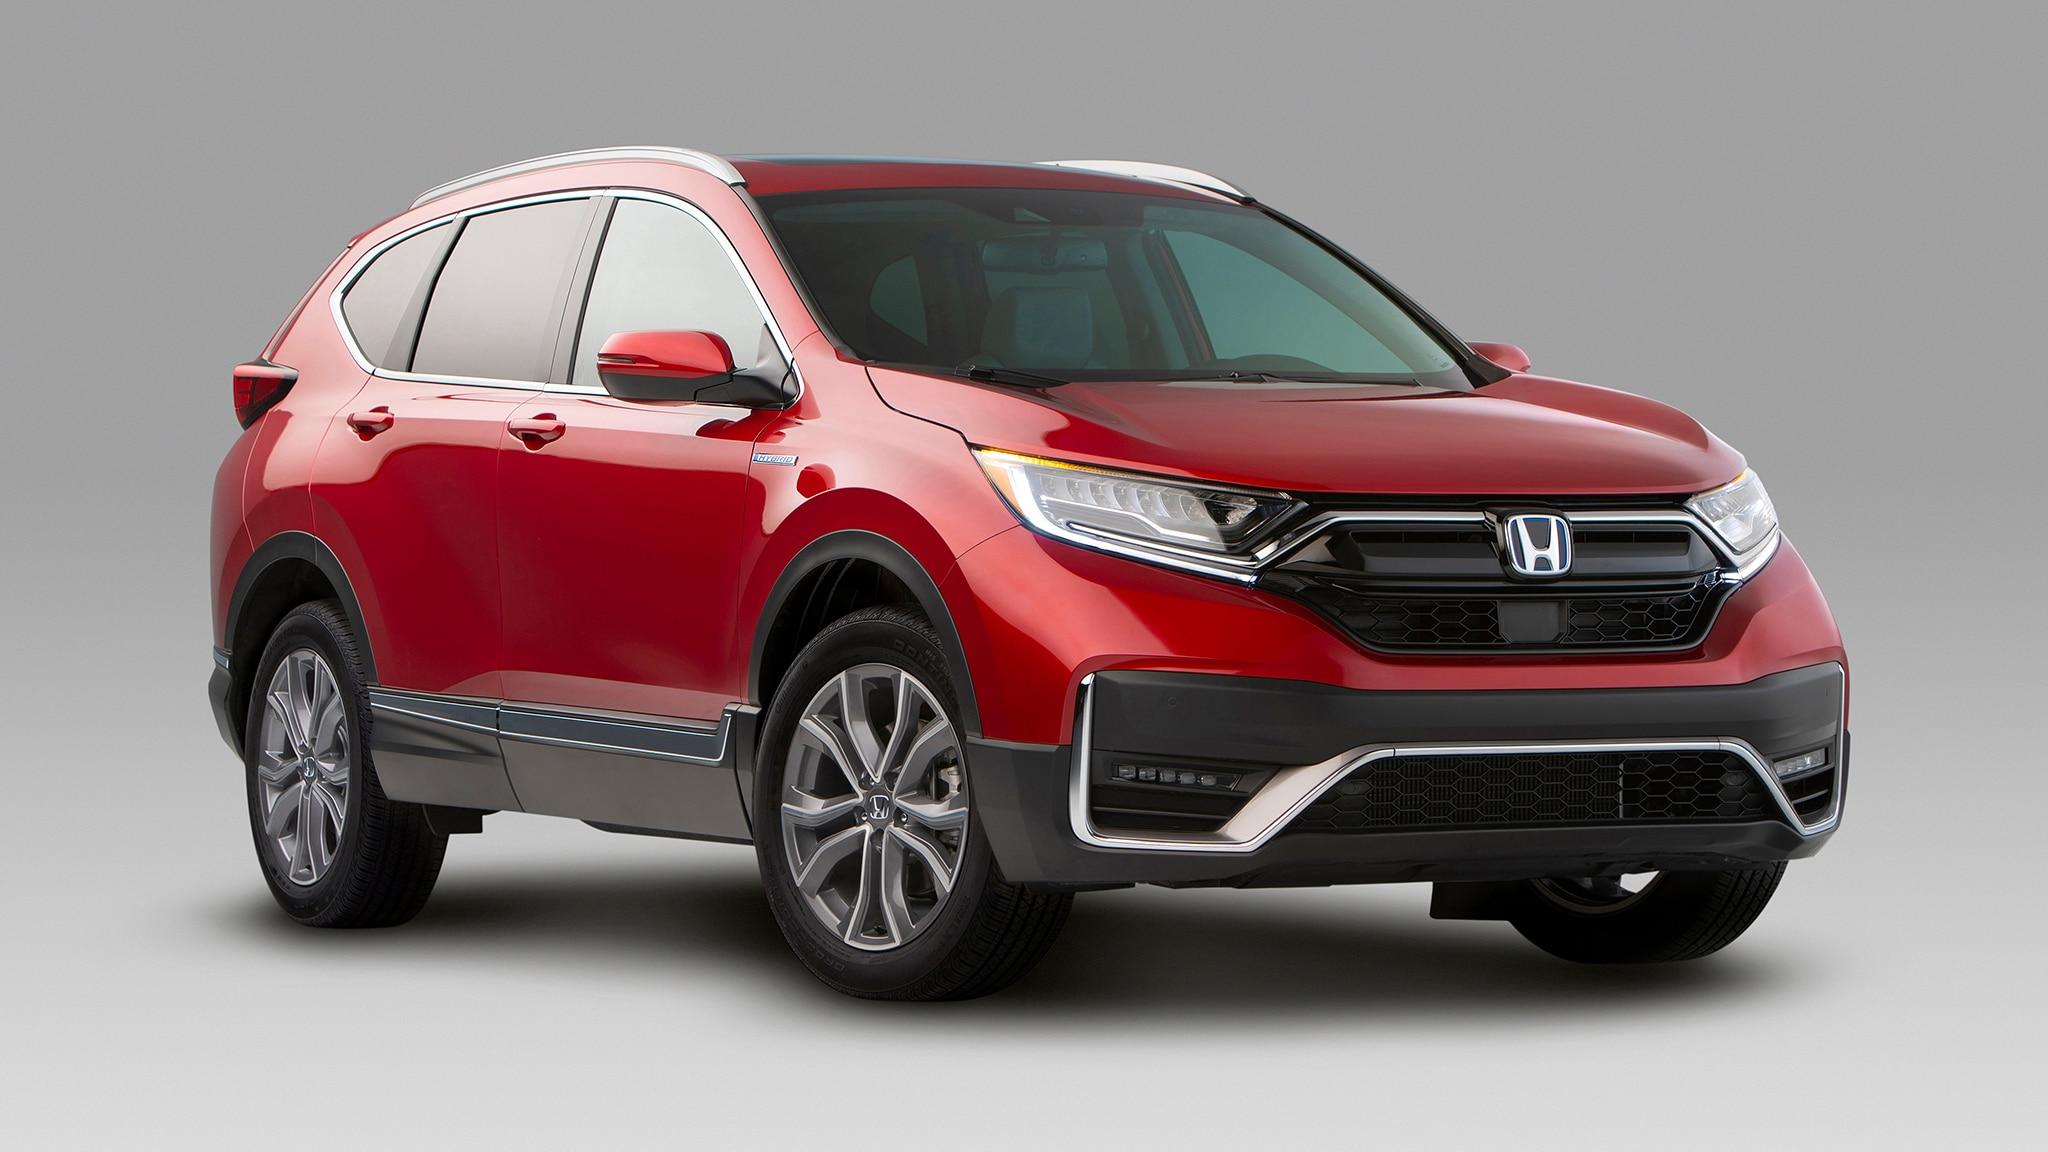 2020 honda cr-v adds hybrid model  drops one engine